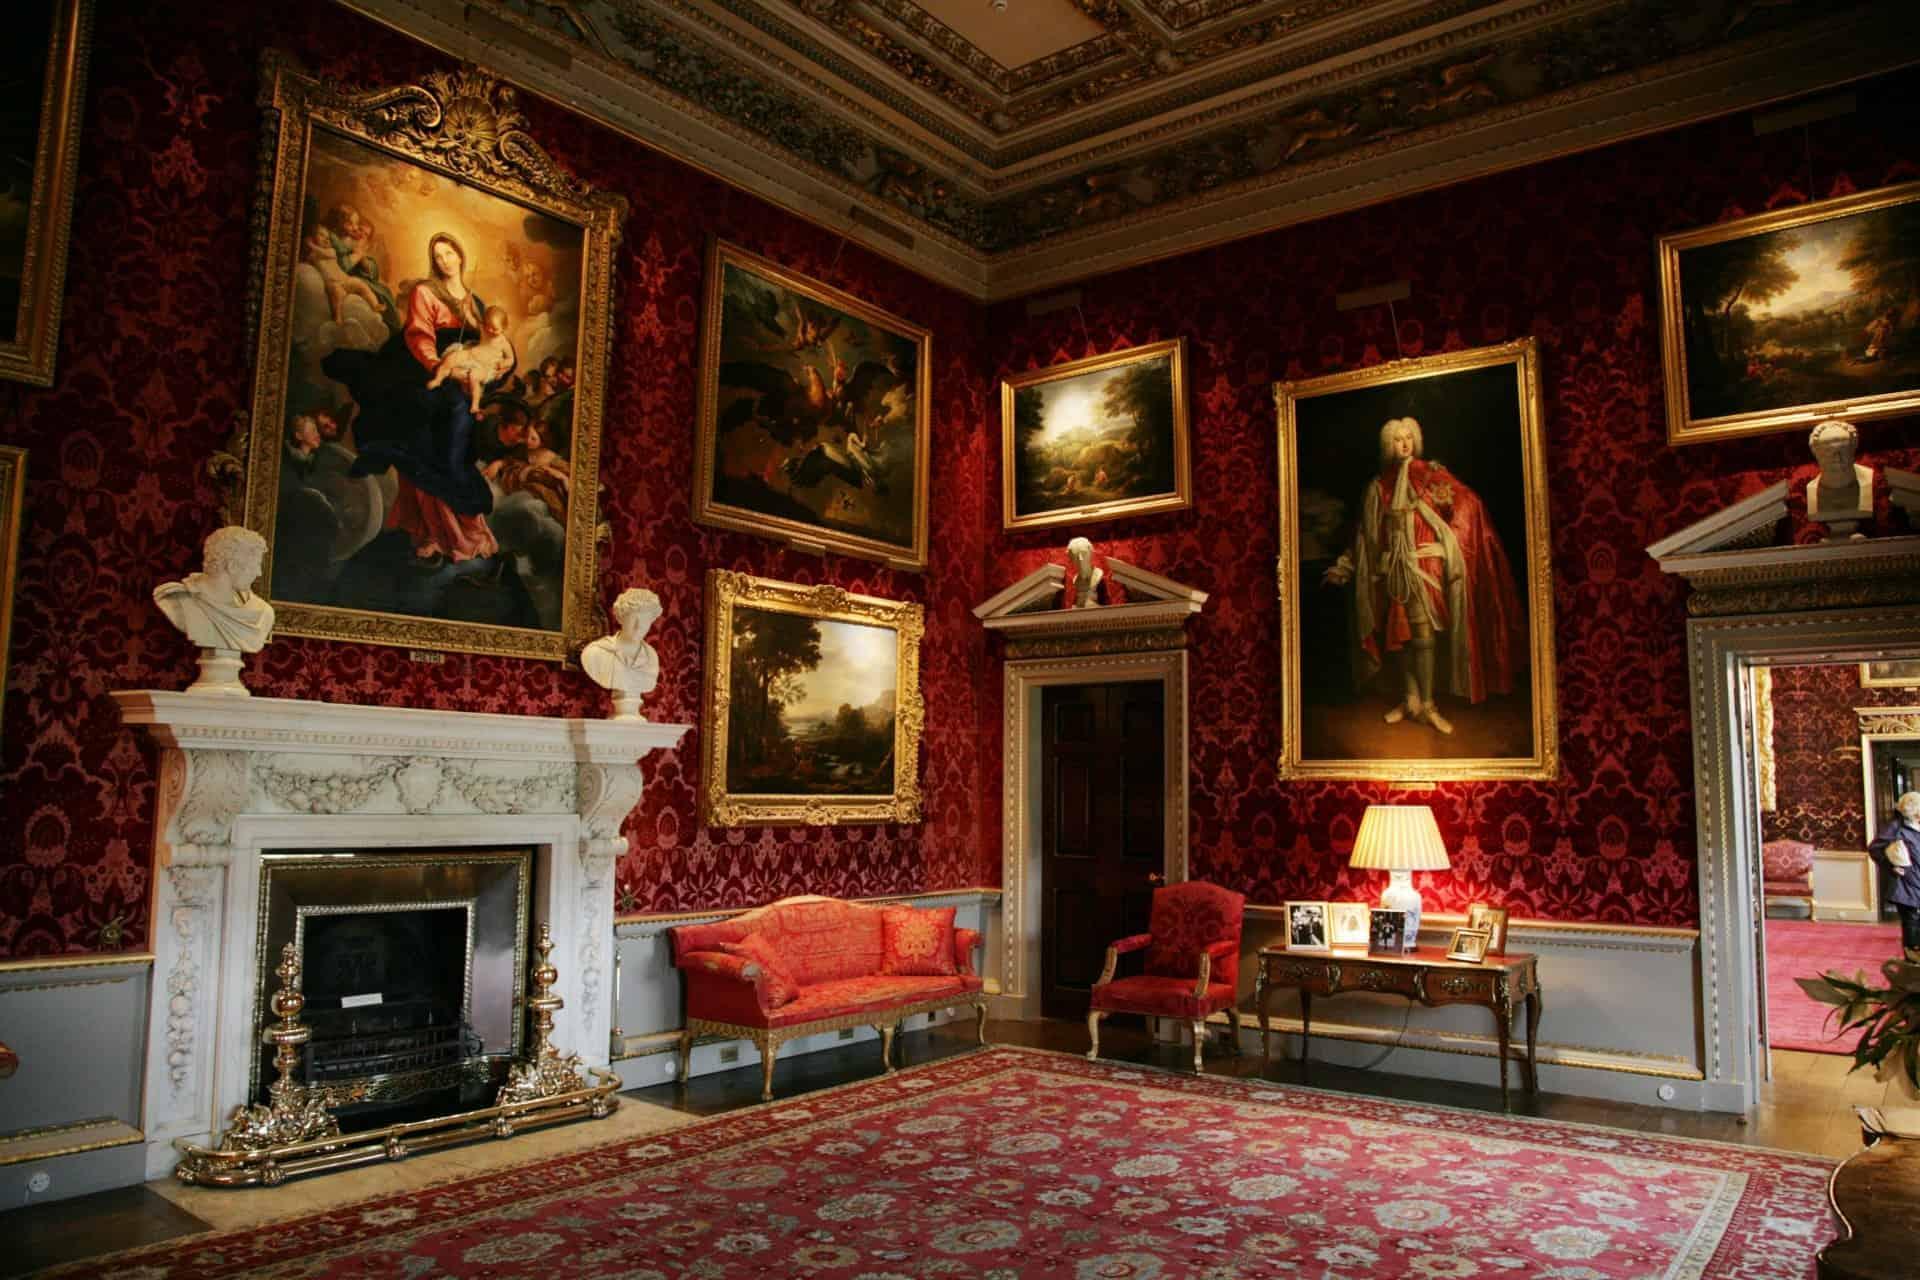 Holkham Hall interior